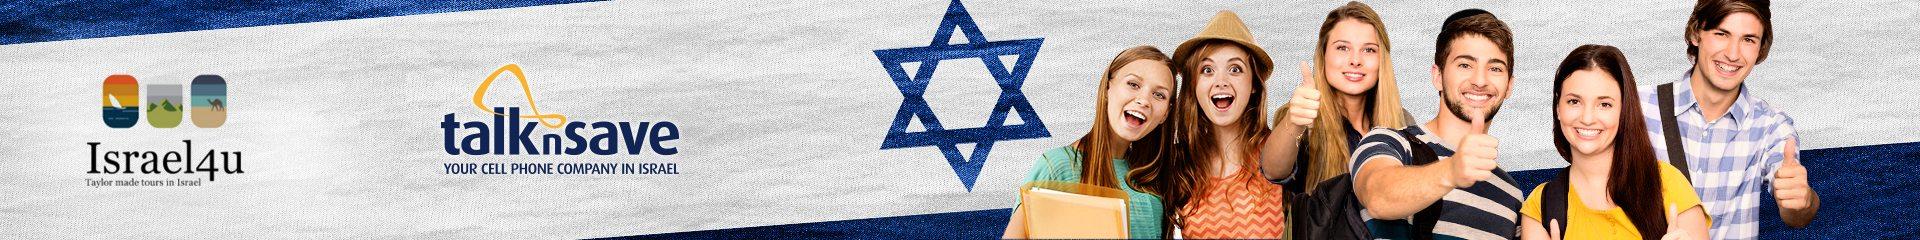 Israel4U-banner